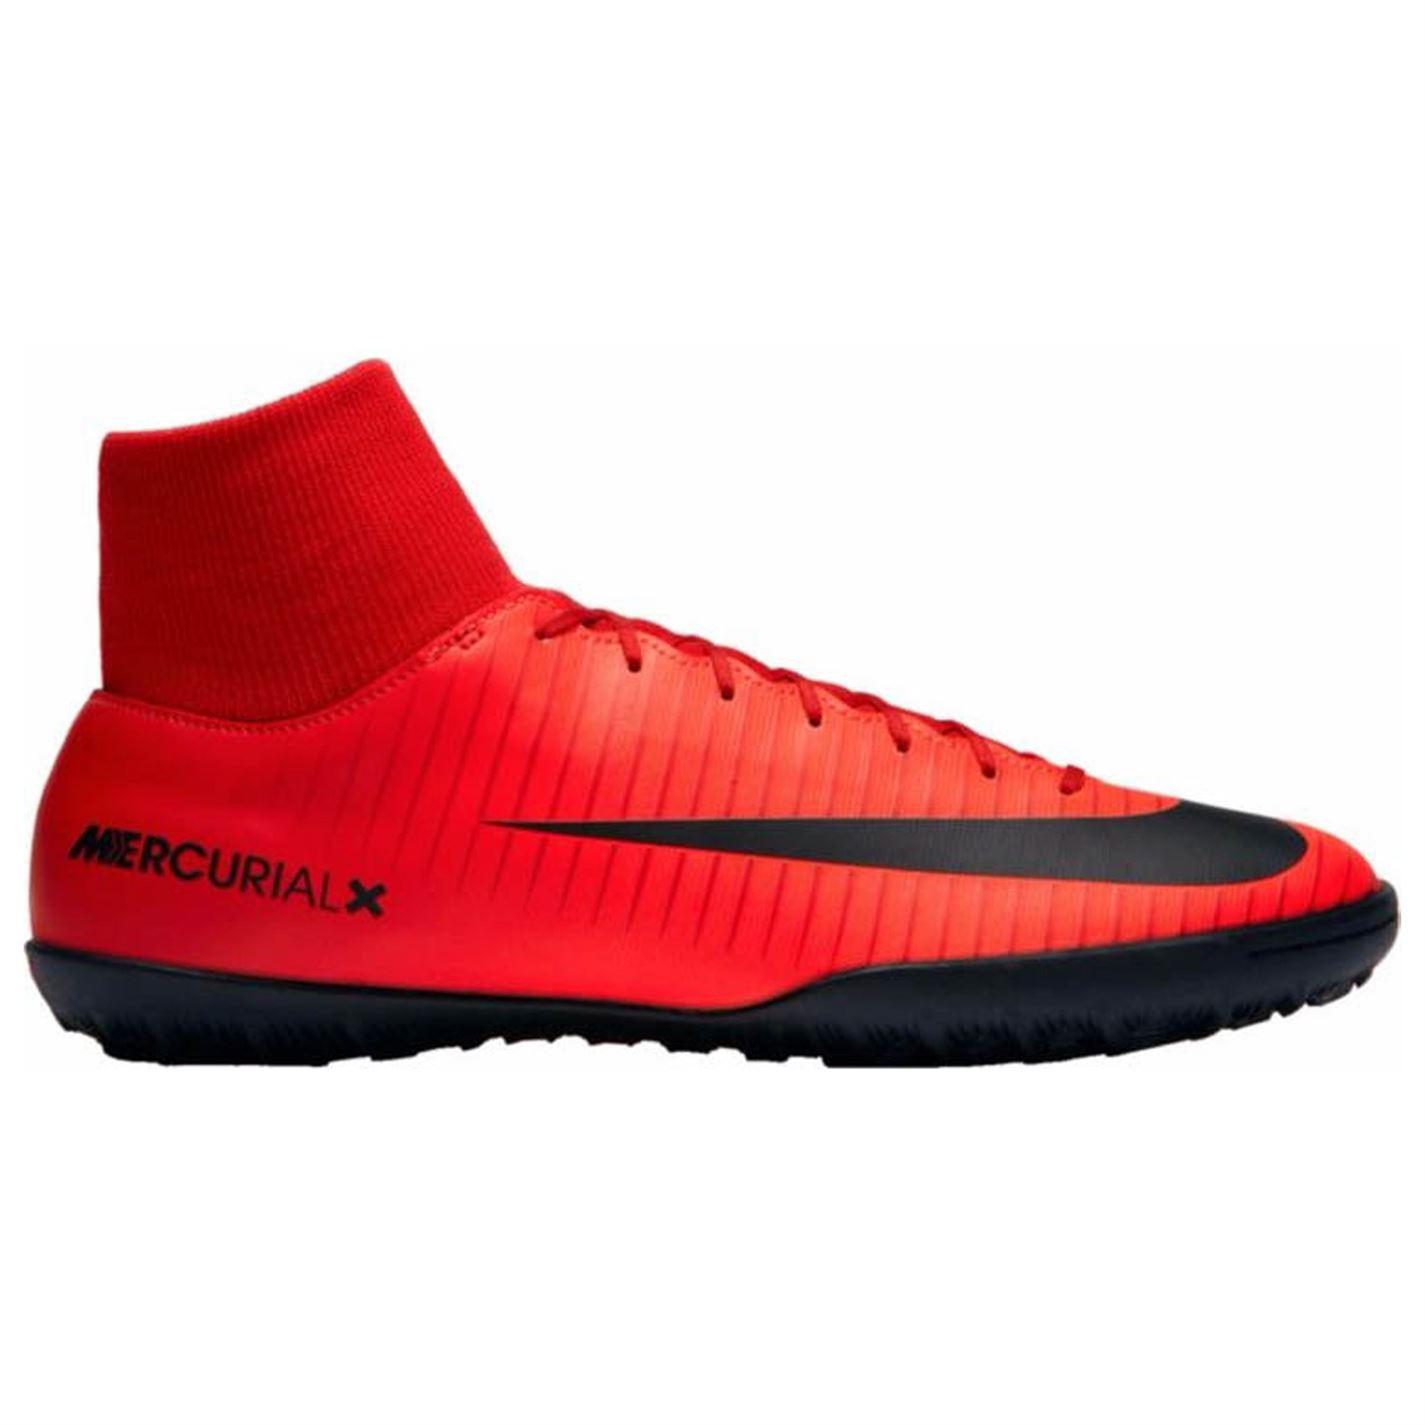 Nike Mercurial Victory DF Mens Astro Turf Trainers